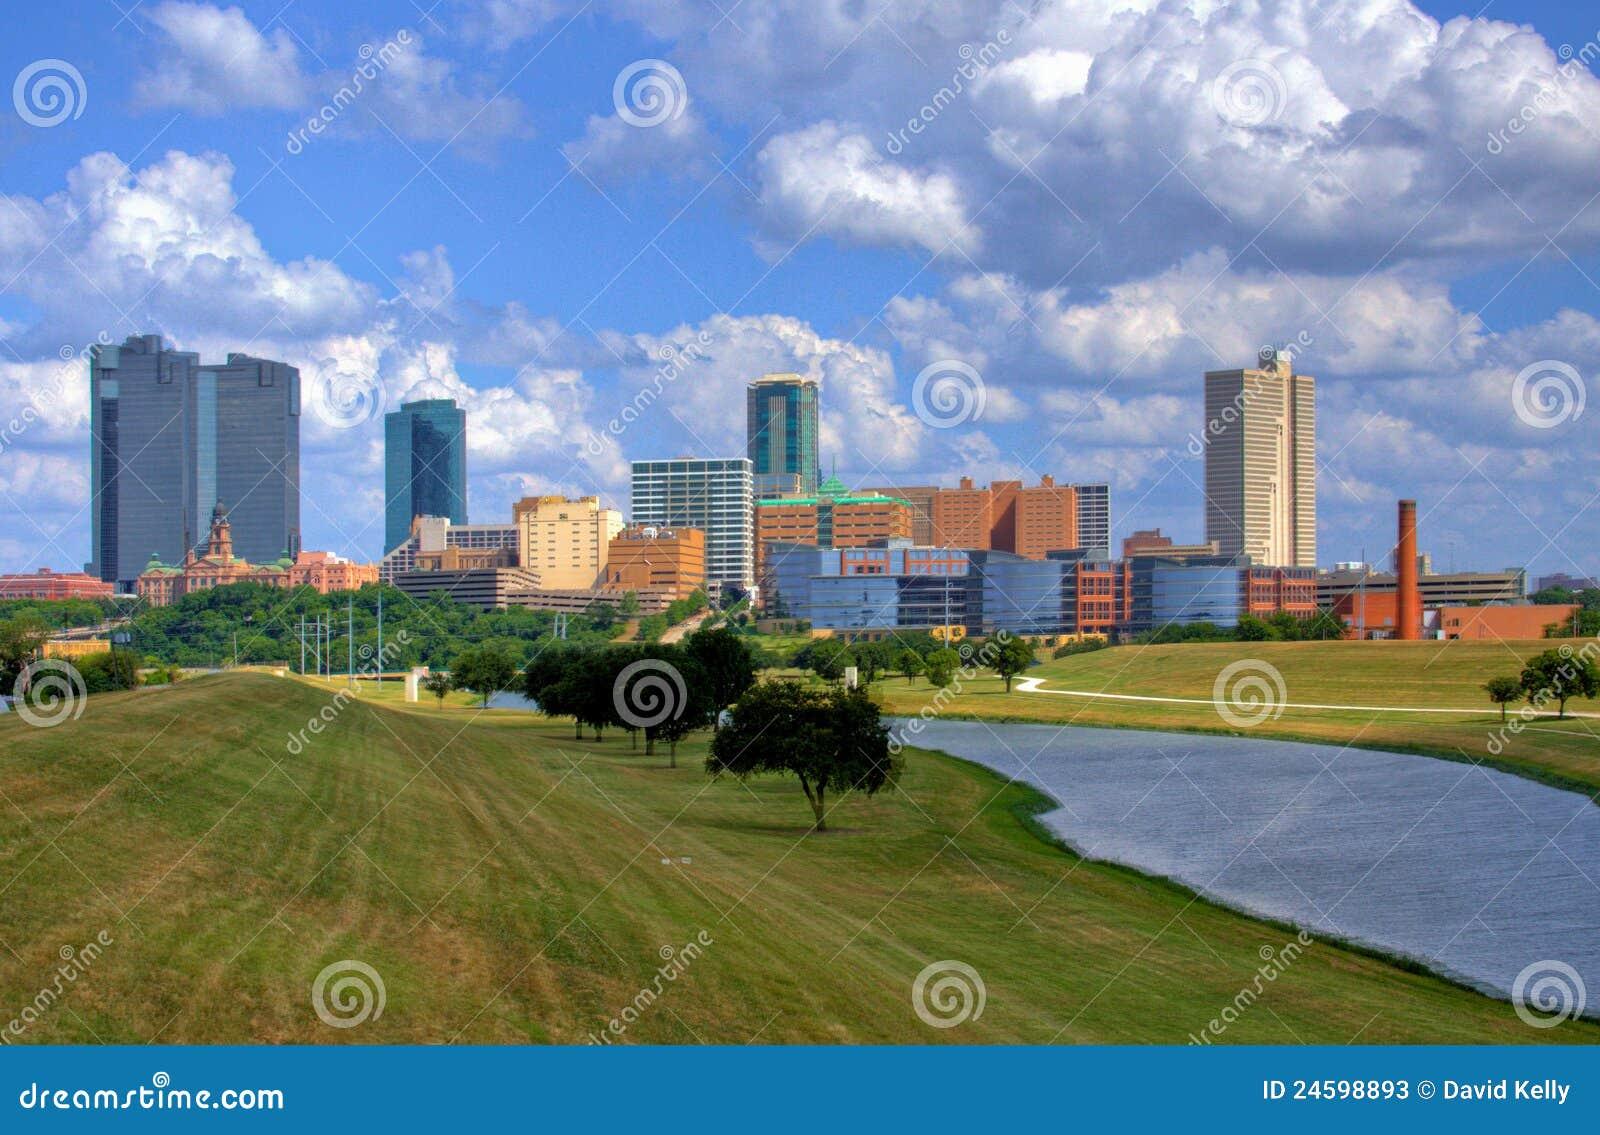 Skyline of Fort Worth Texas